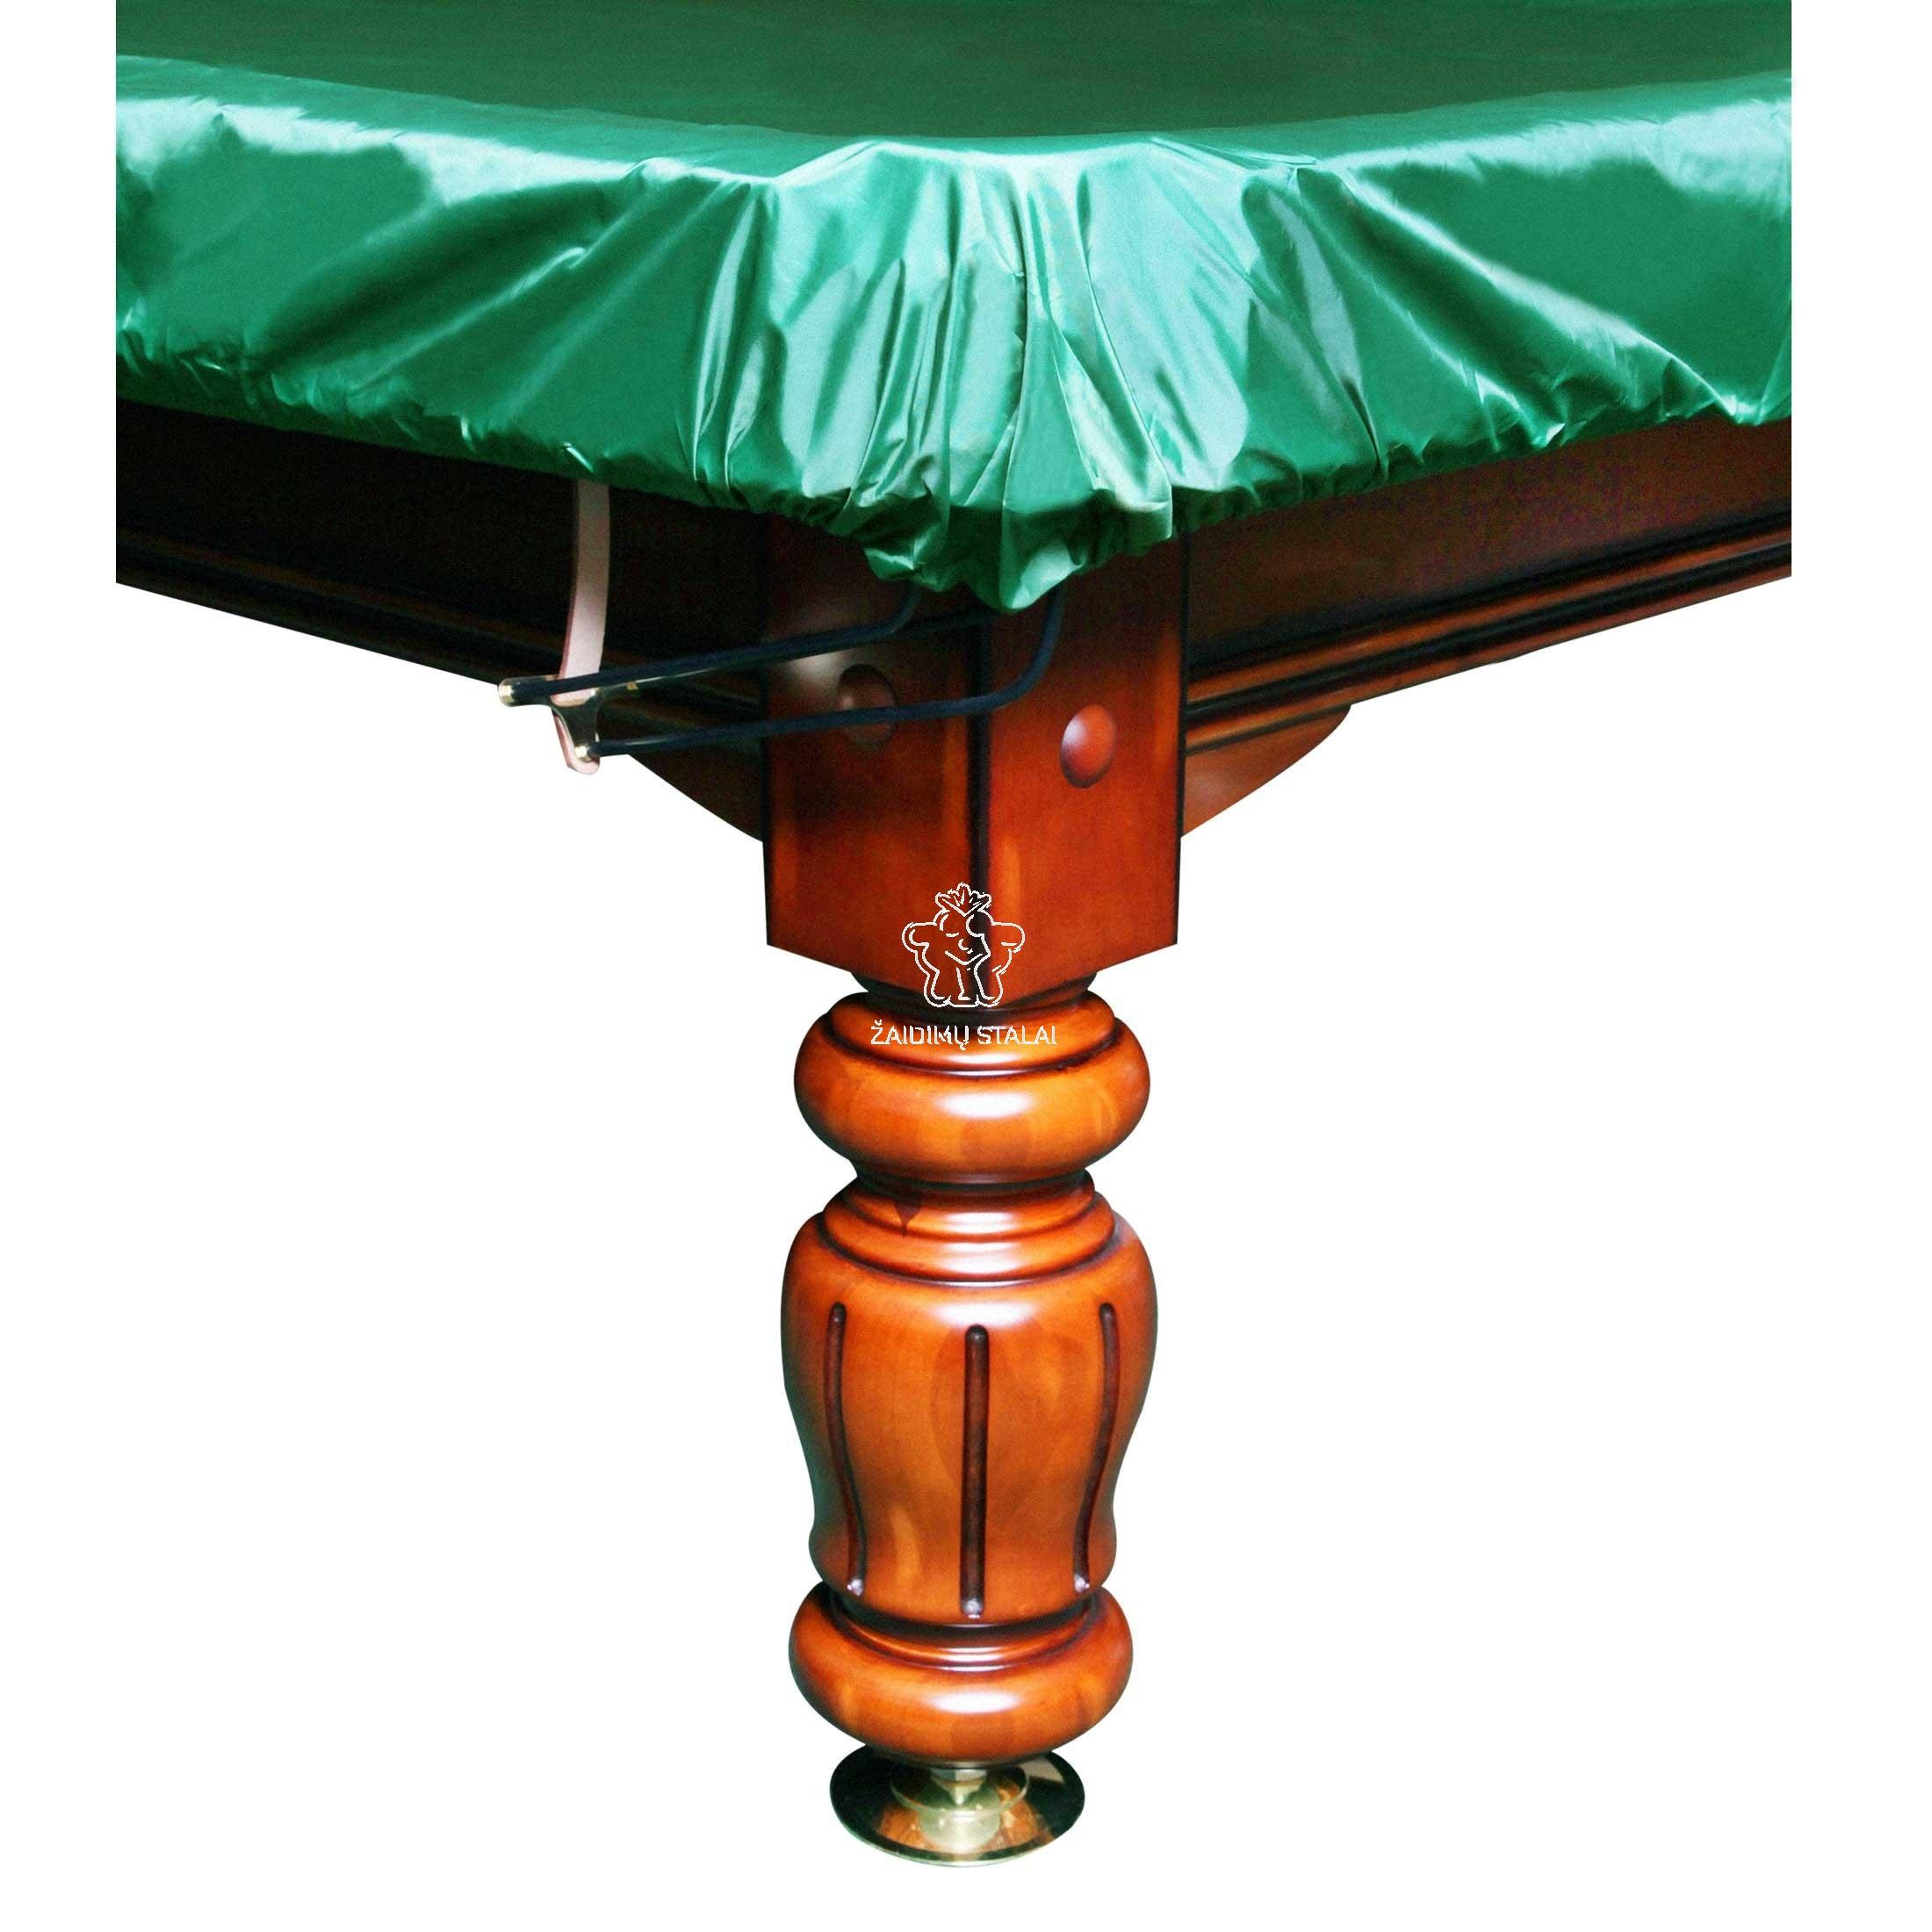 Biliardo stalo uždangalas 10, su guma, žalios spalvos